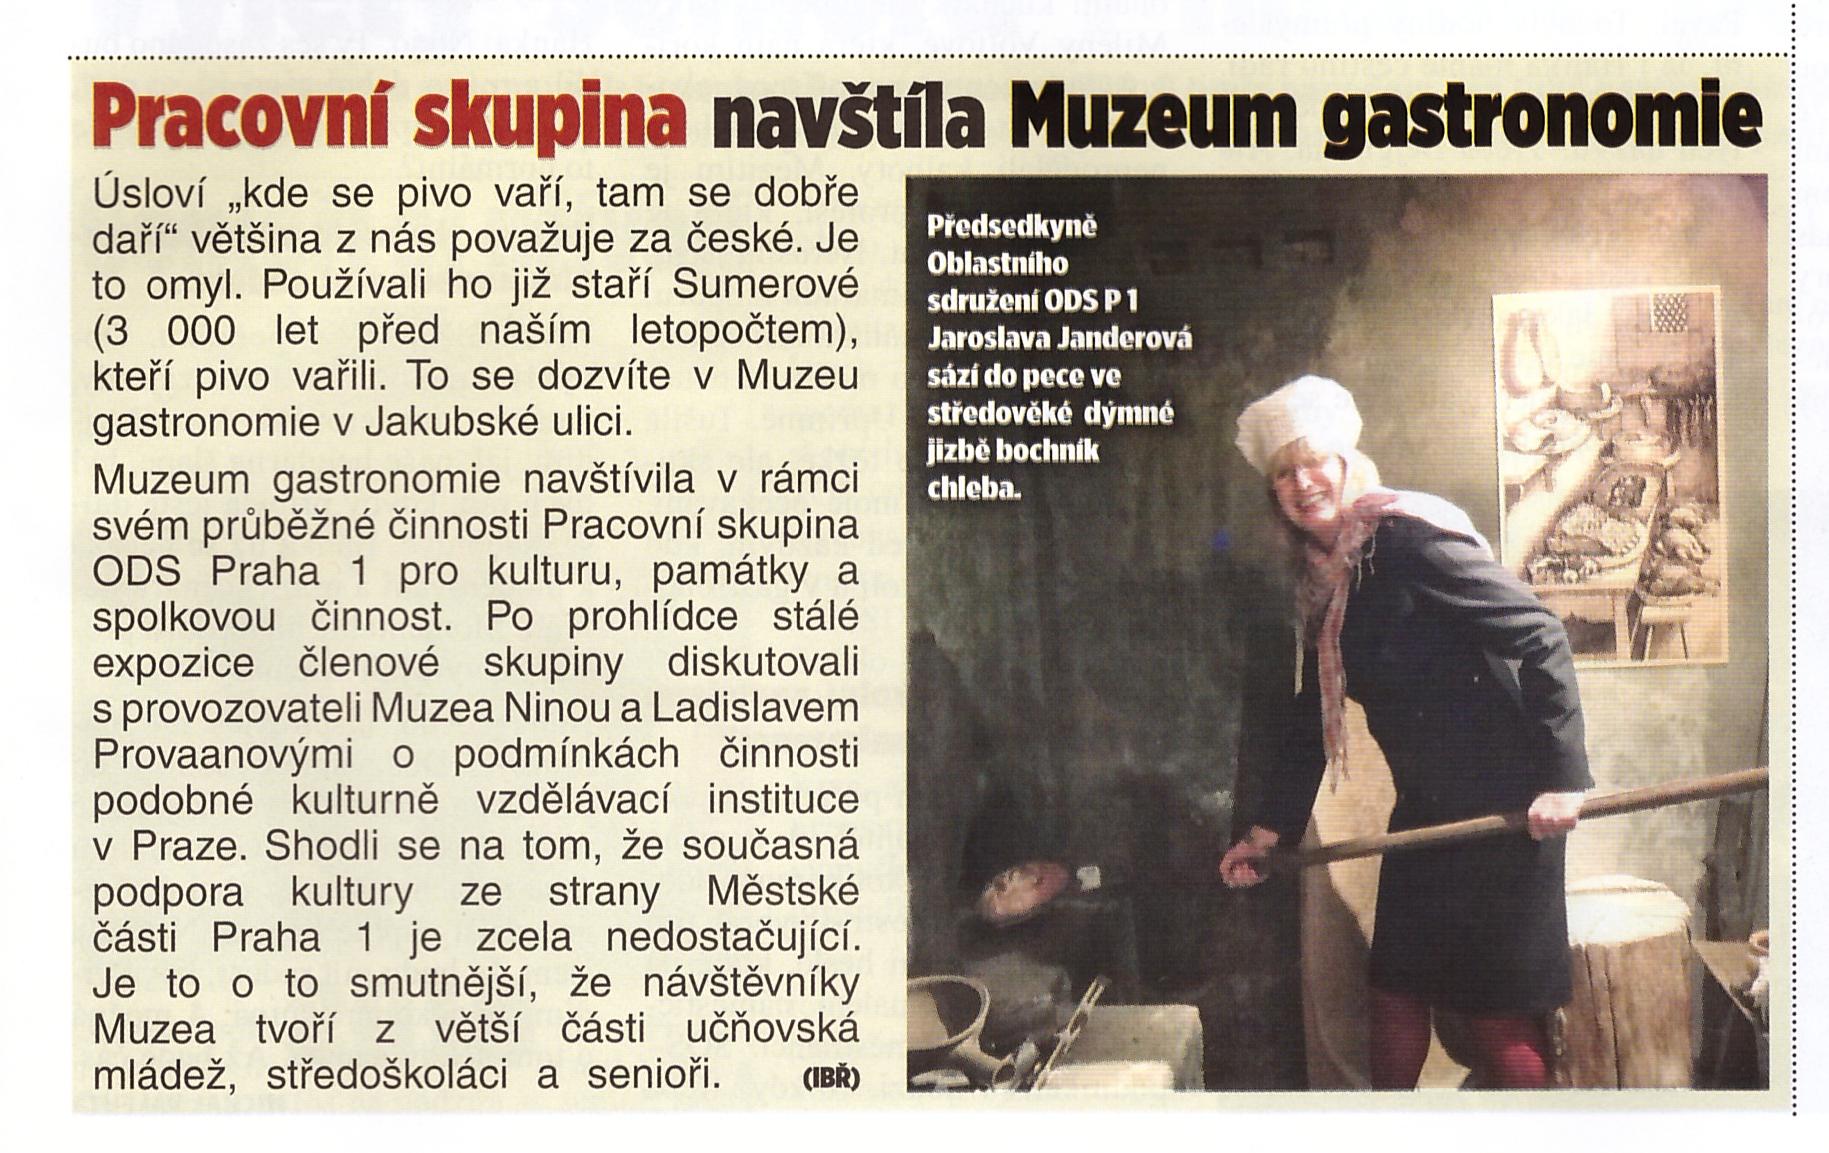 Právo Muzeum gastronomie